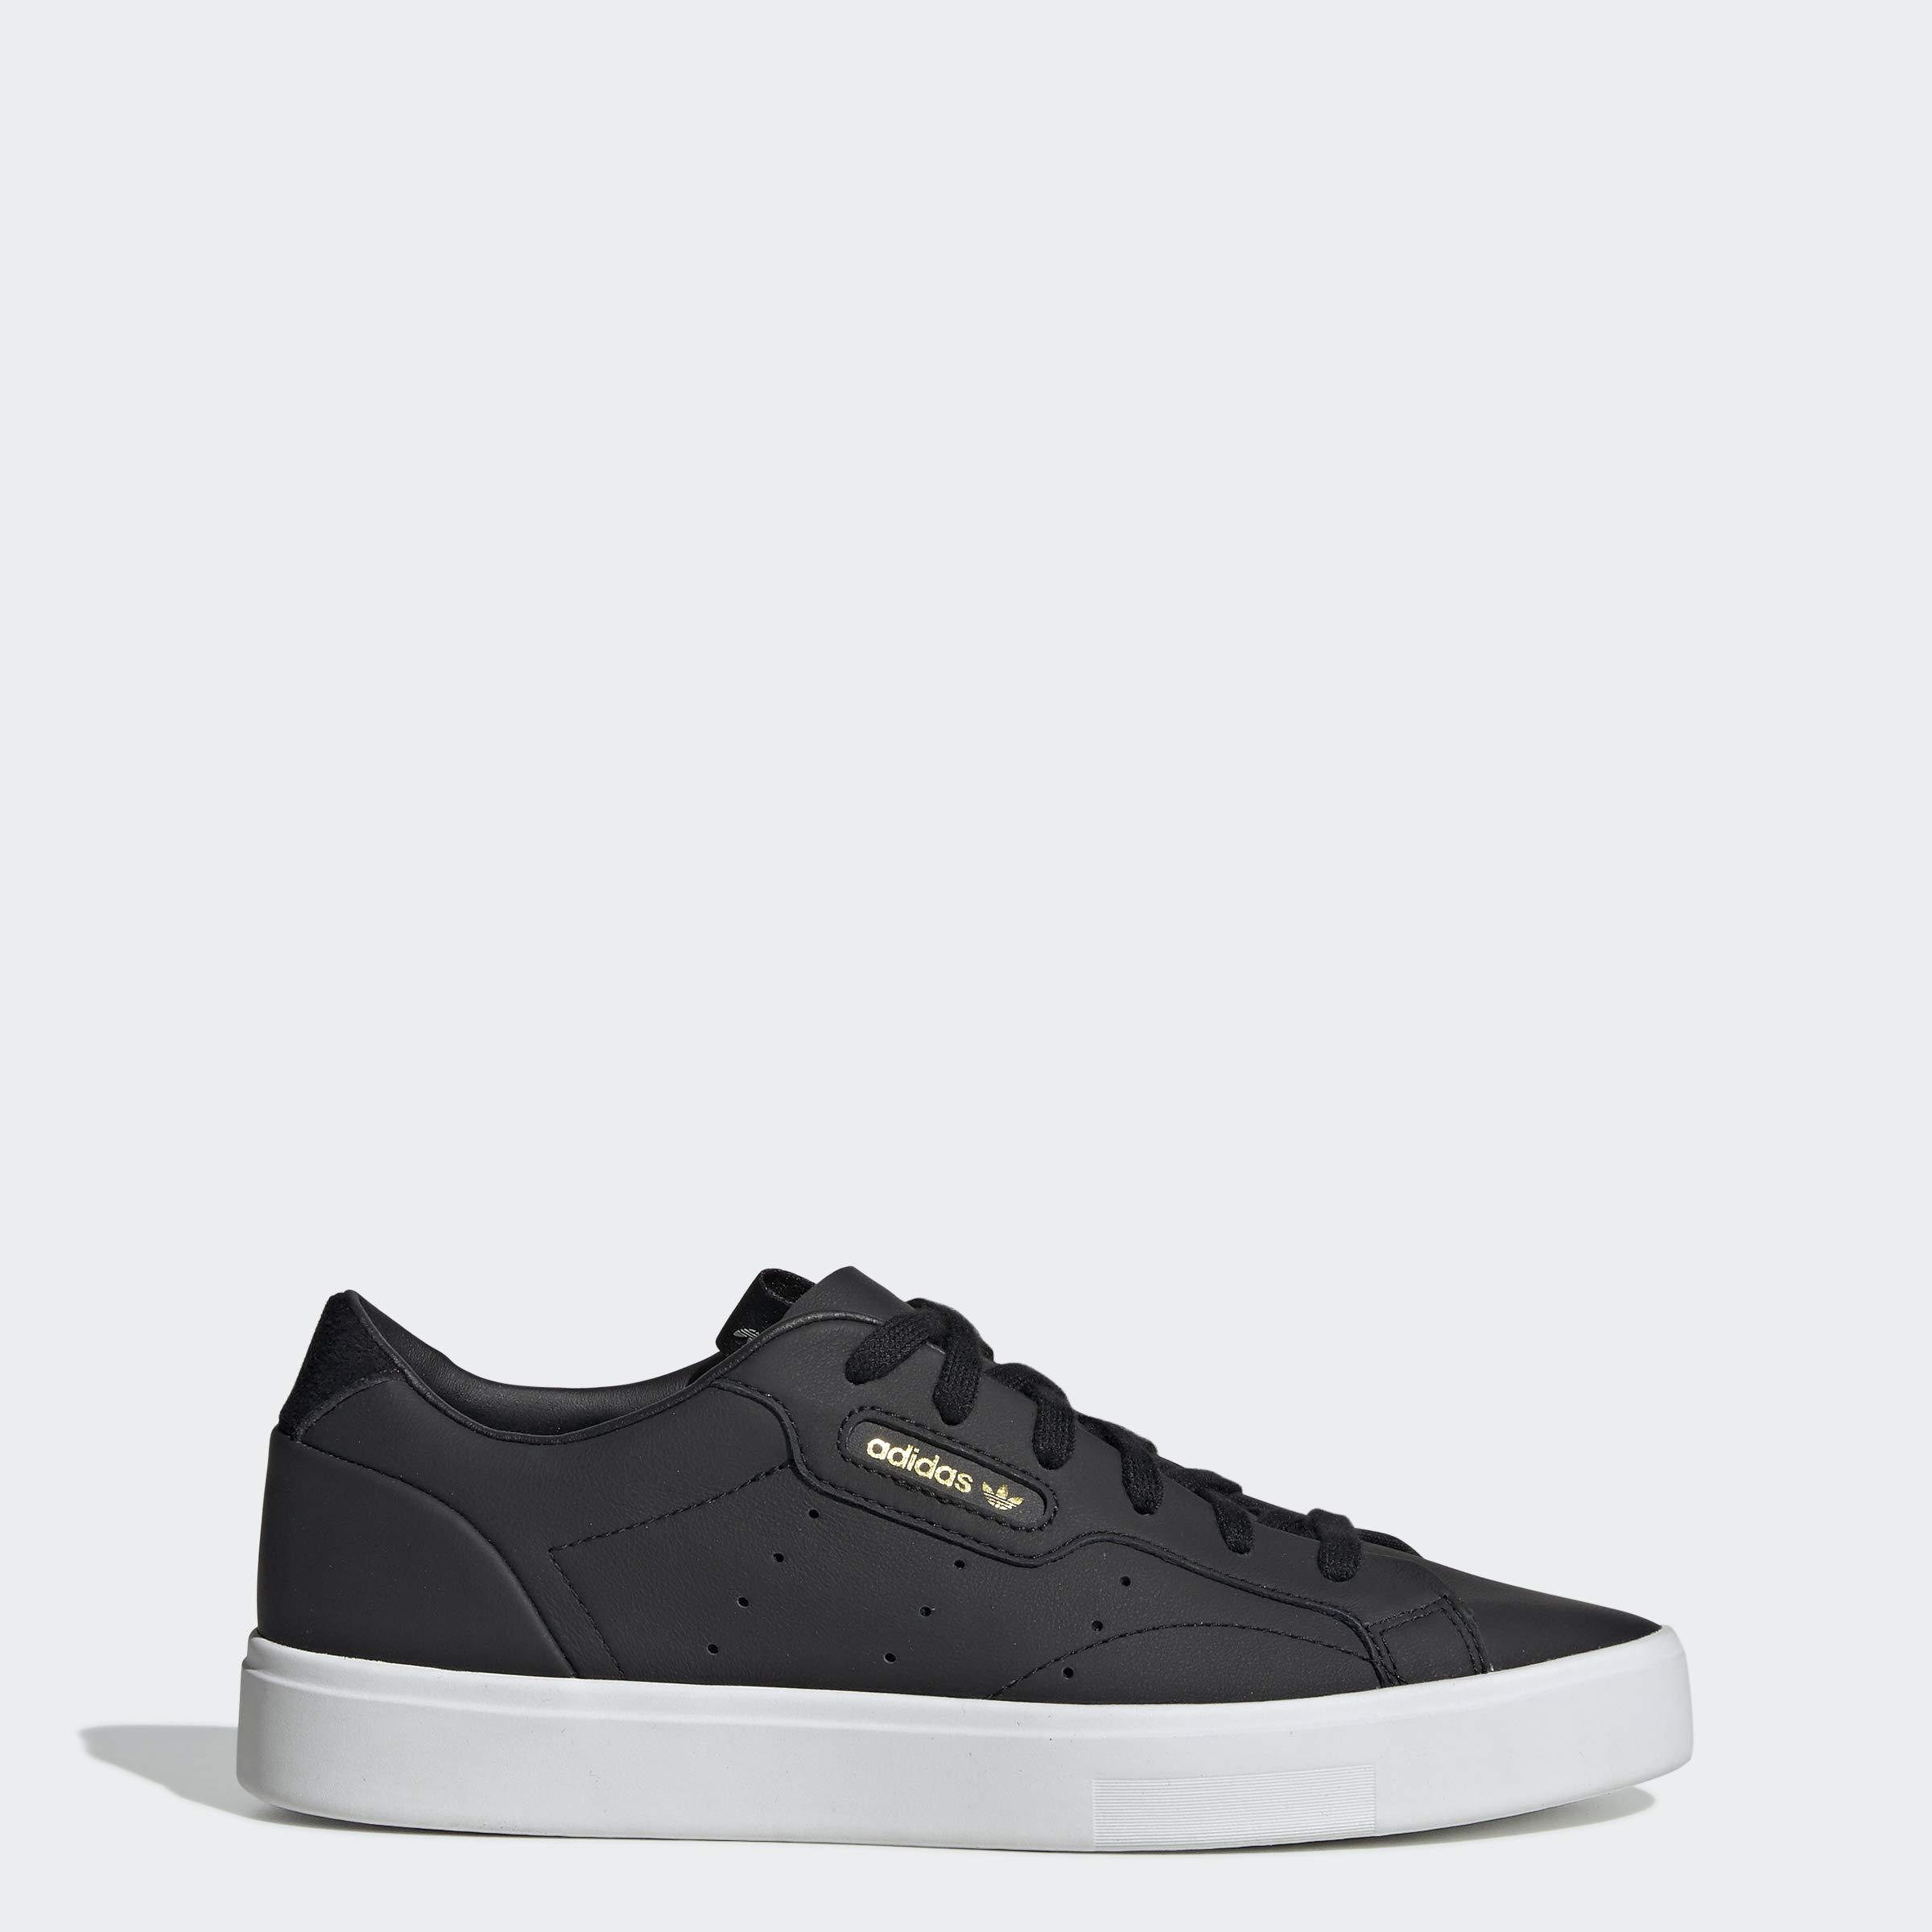 adidas Originals Women's Sleek Sneaker Black/Crystal White, 5.5 M US